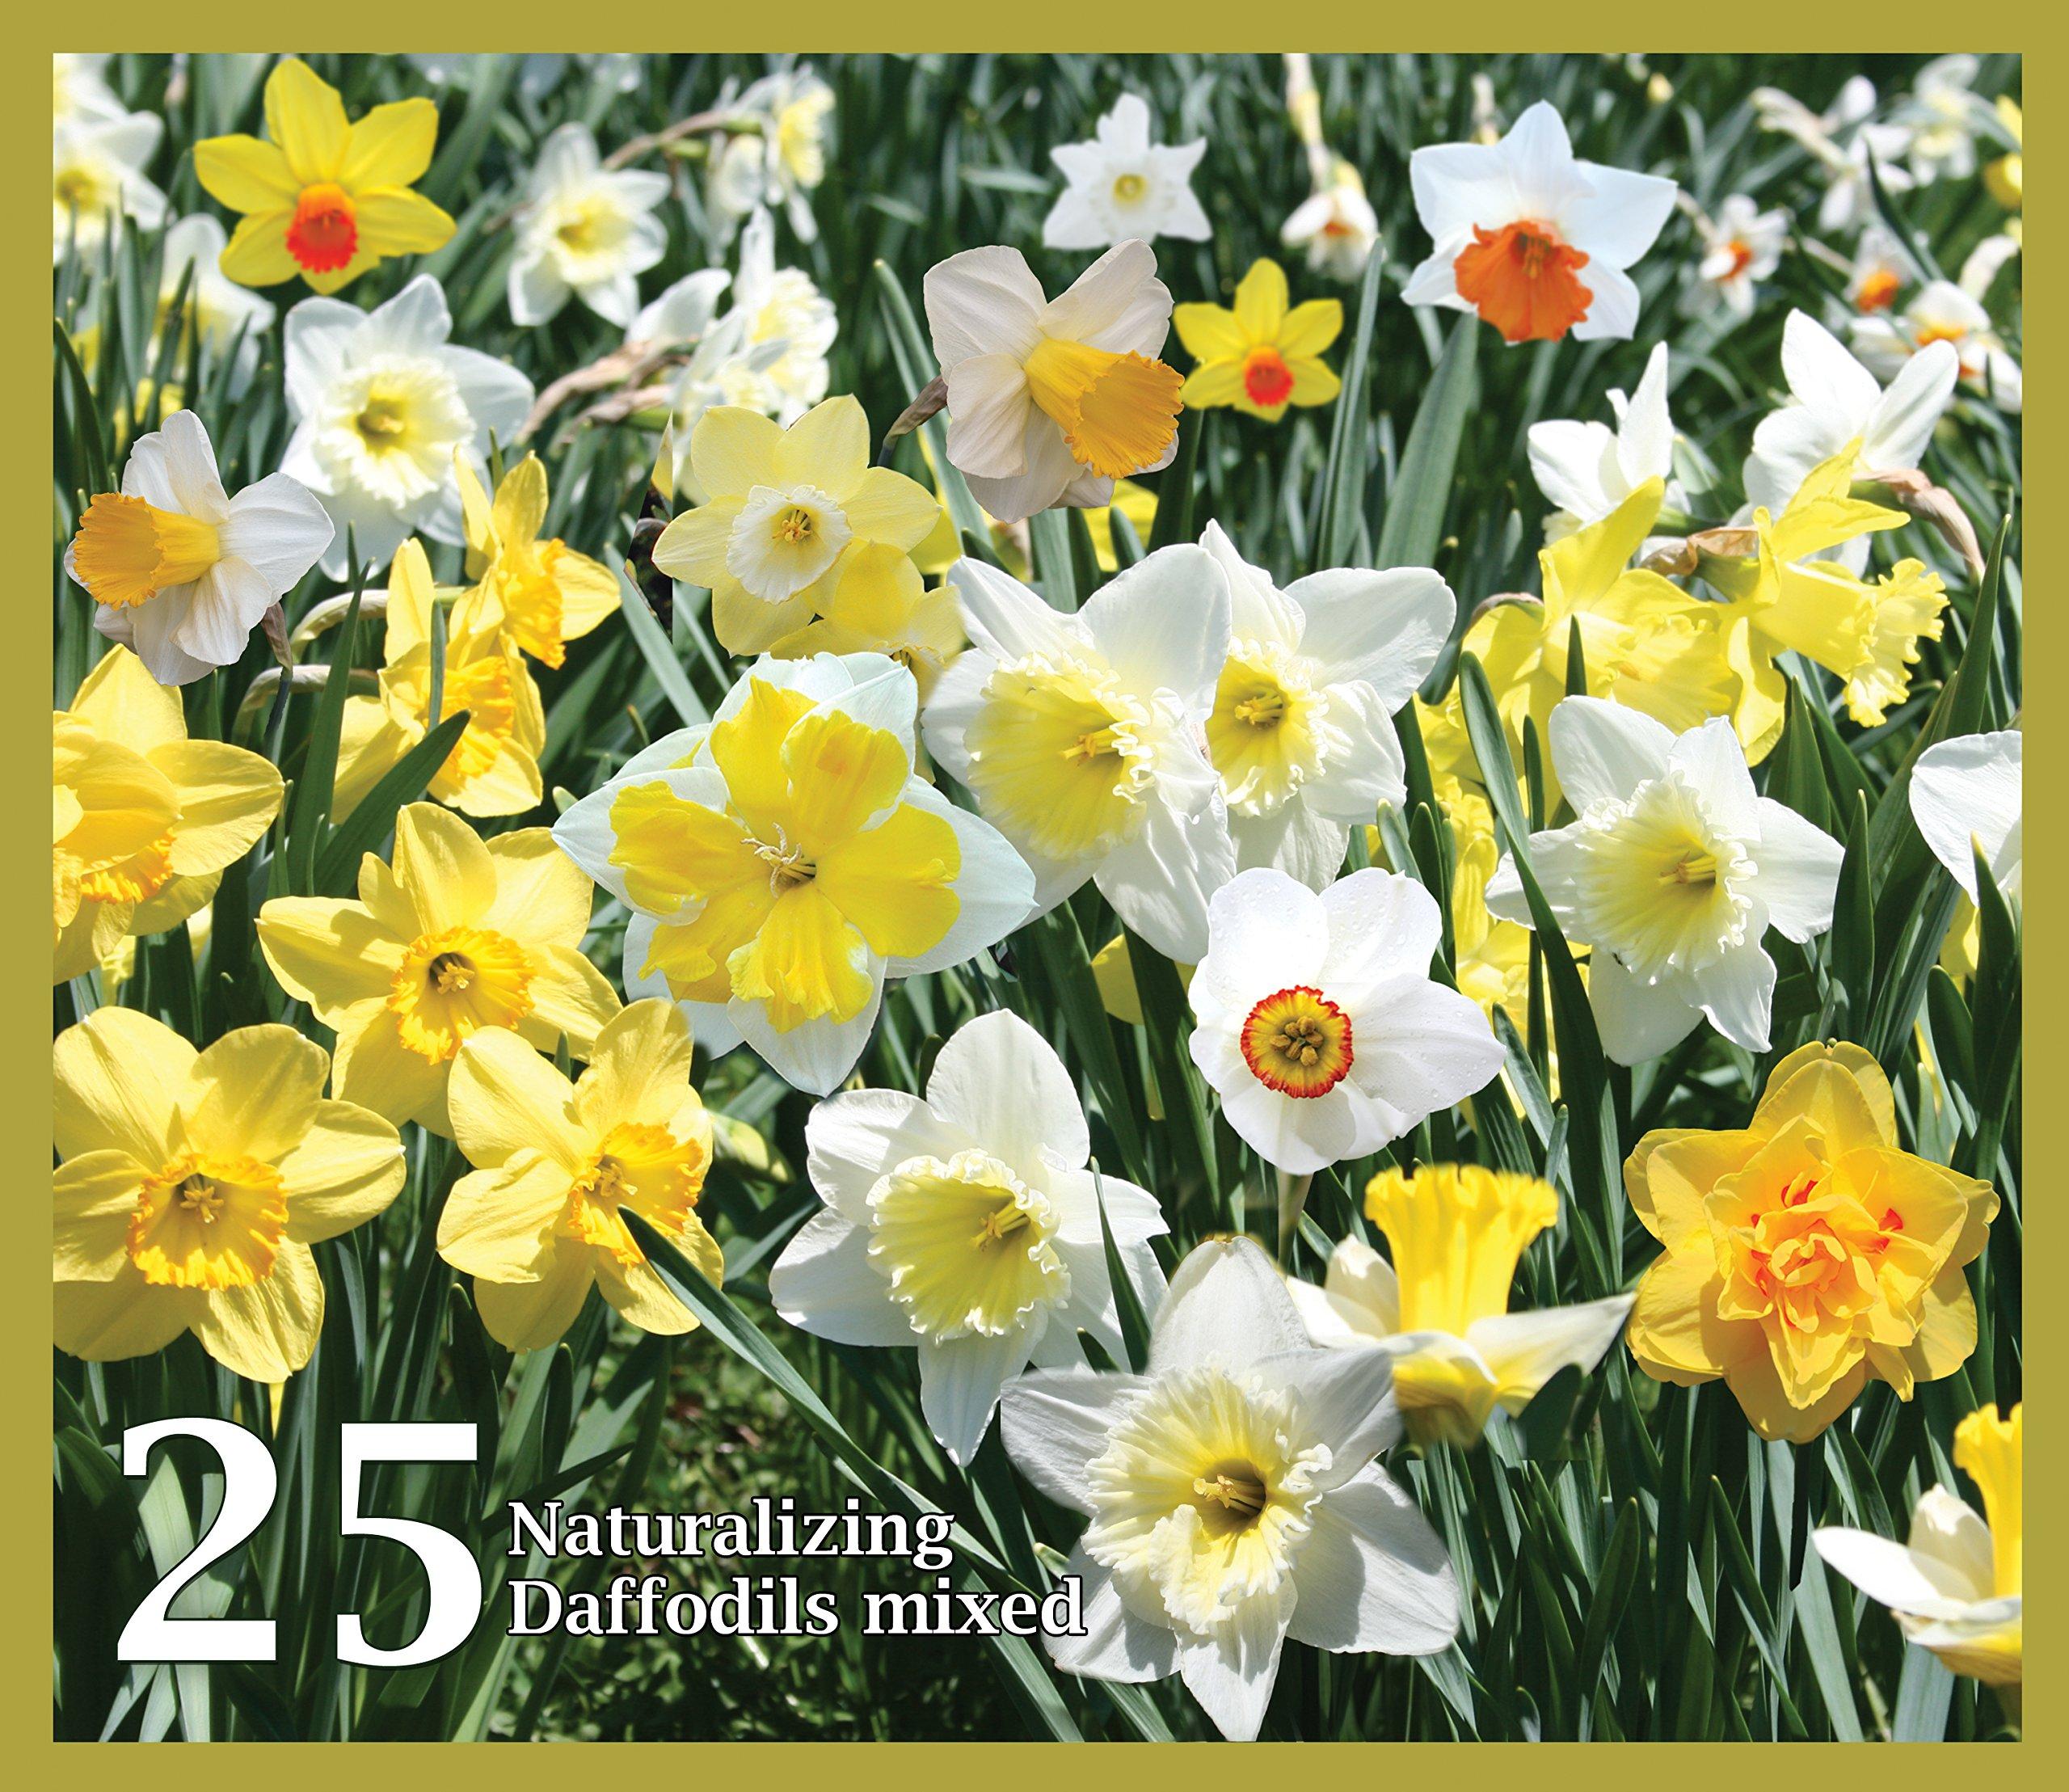 Mixed Daffodils (25 Bulbs) - Assorted Colors Daffodil Narcissus Bulbs by Willard & May by Willard & May